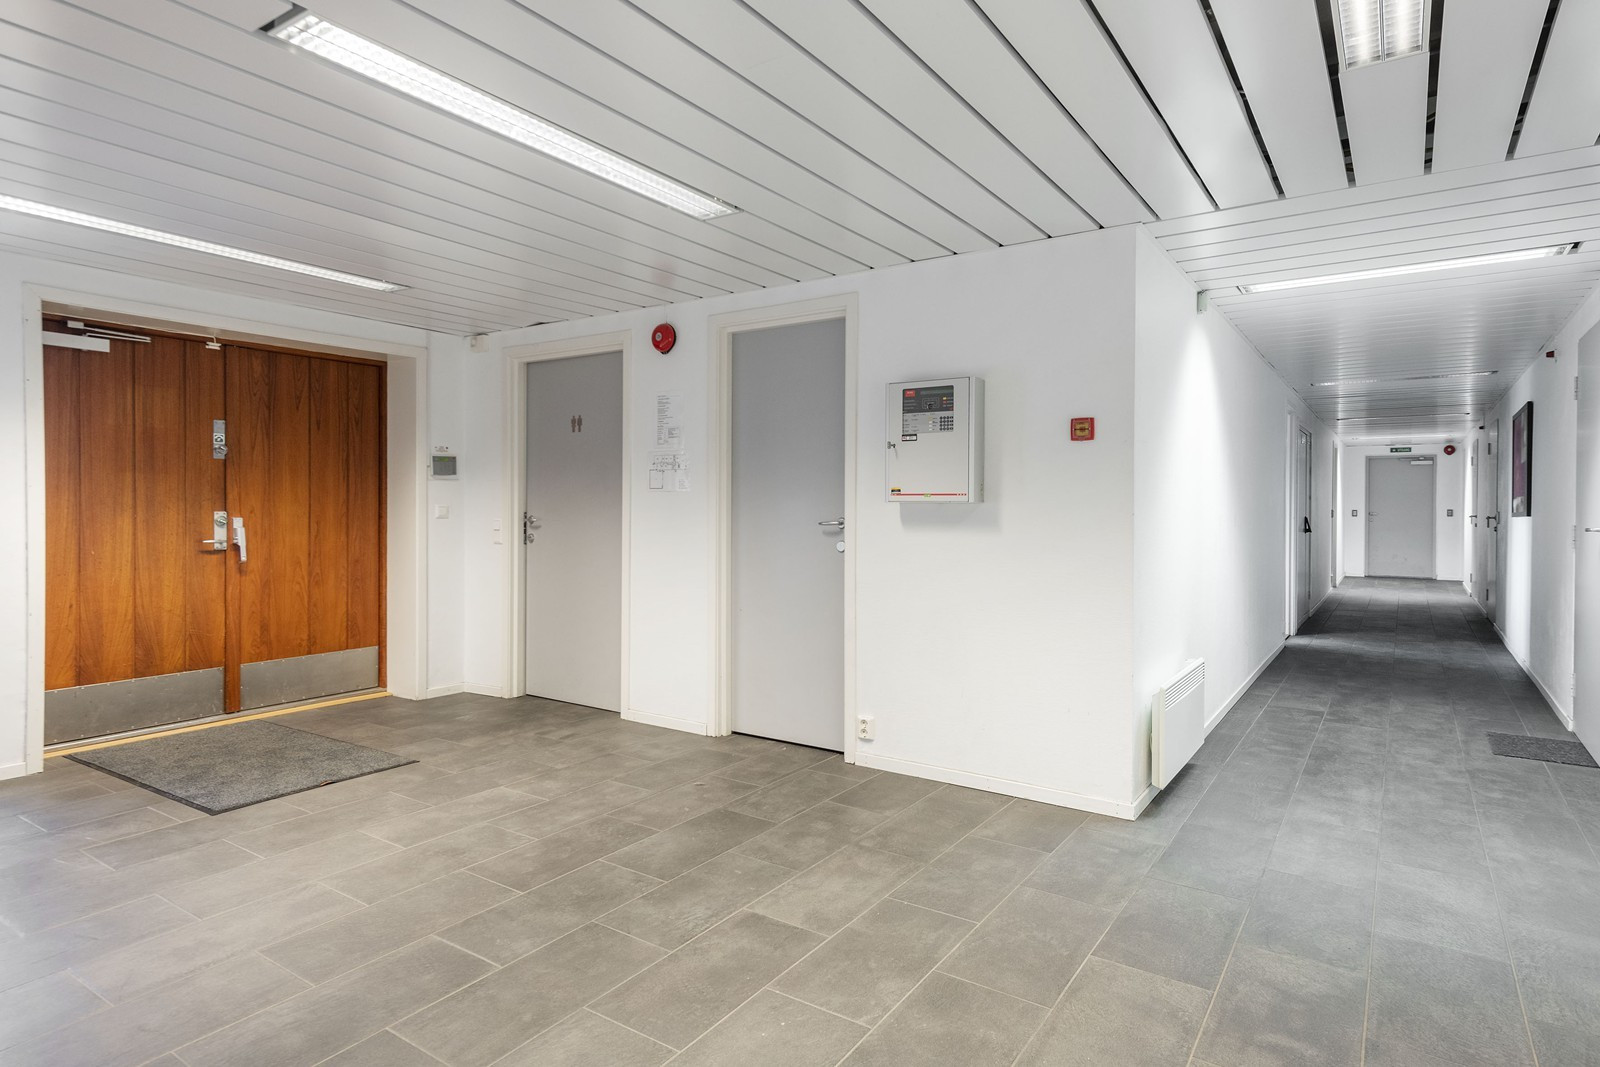 Inngang kontordel/fellesarealer 1. etasje